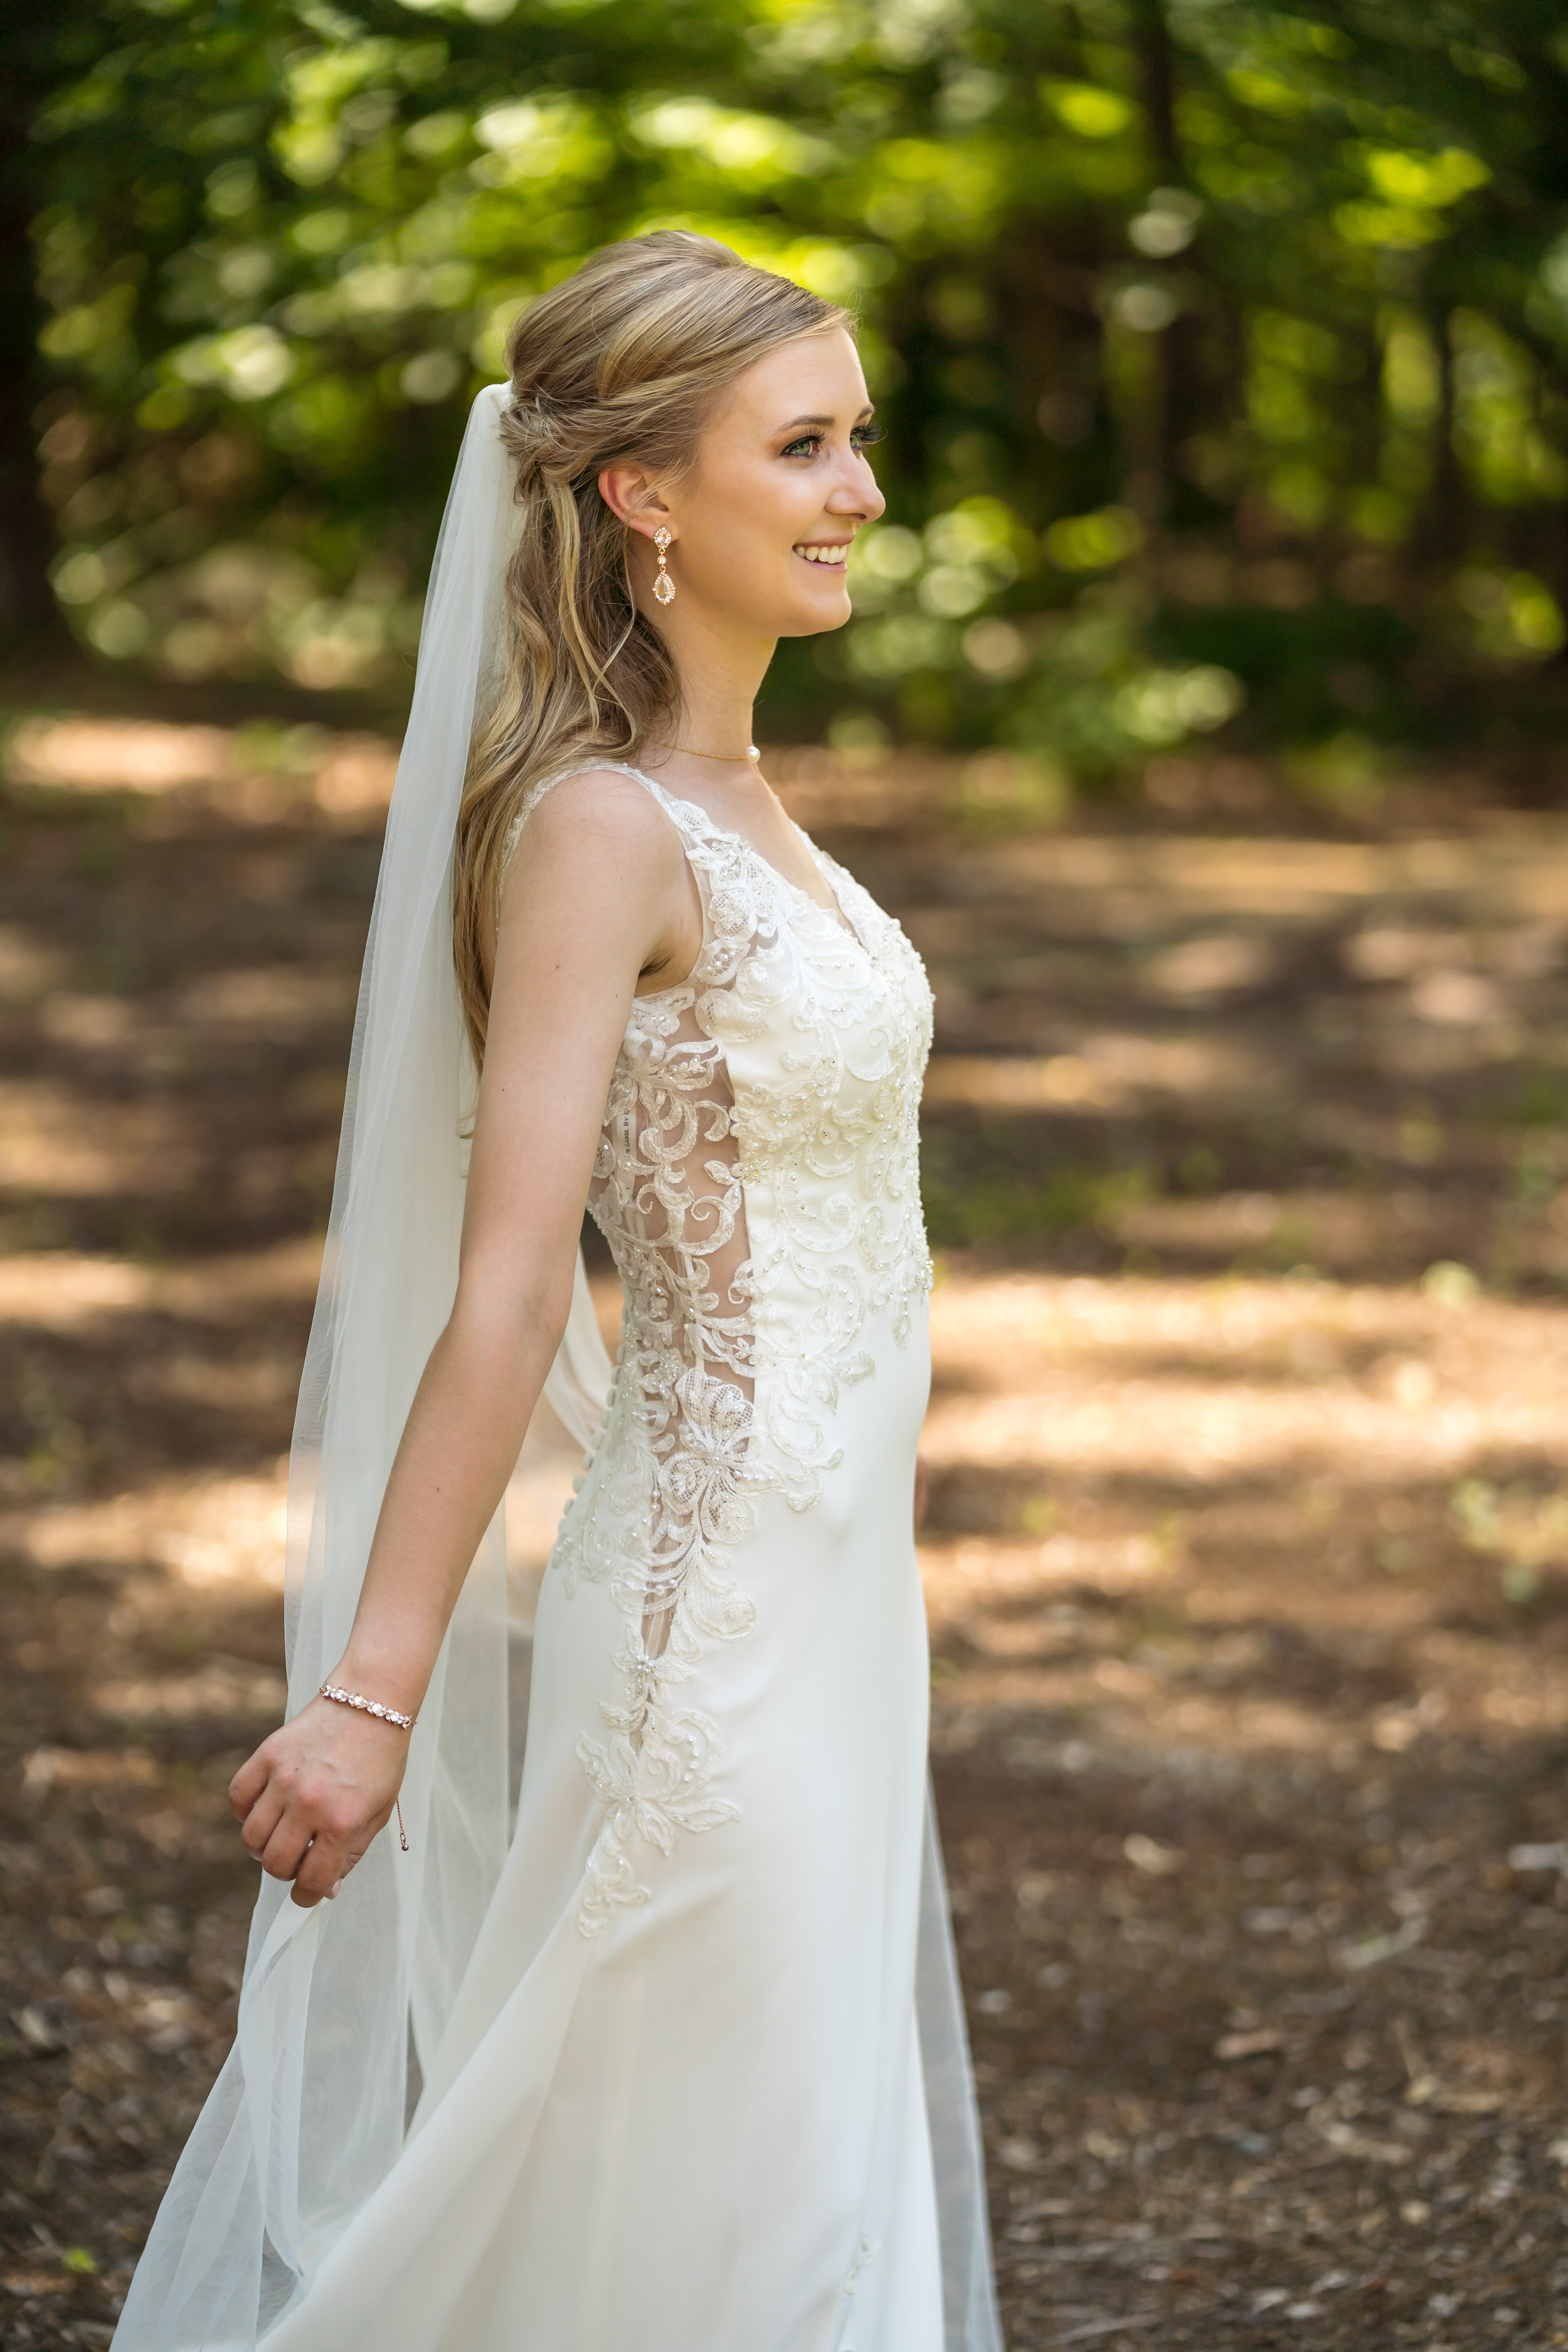 sarah_ikeem_wedding_at_the_parlour_at_manns_chapel_05.18.19-02144.jpg